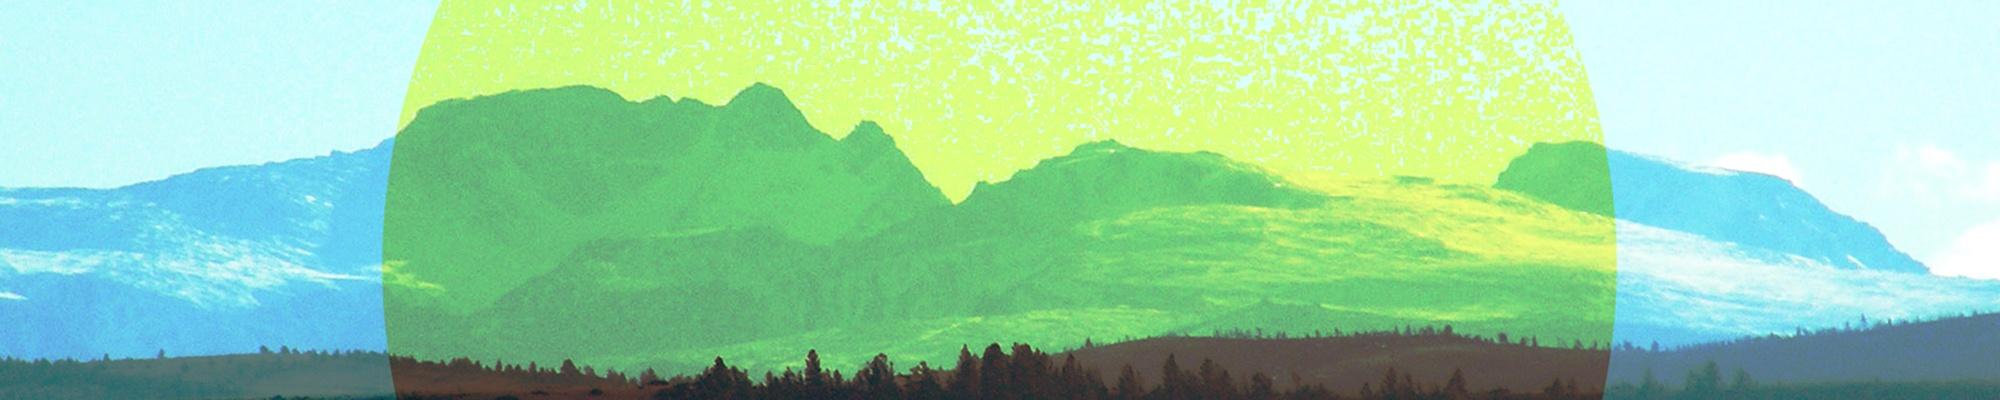 sebastianillustration Cover